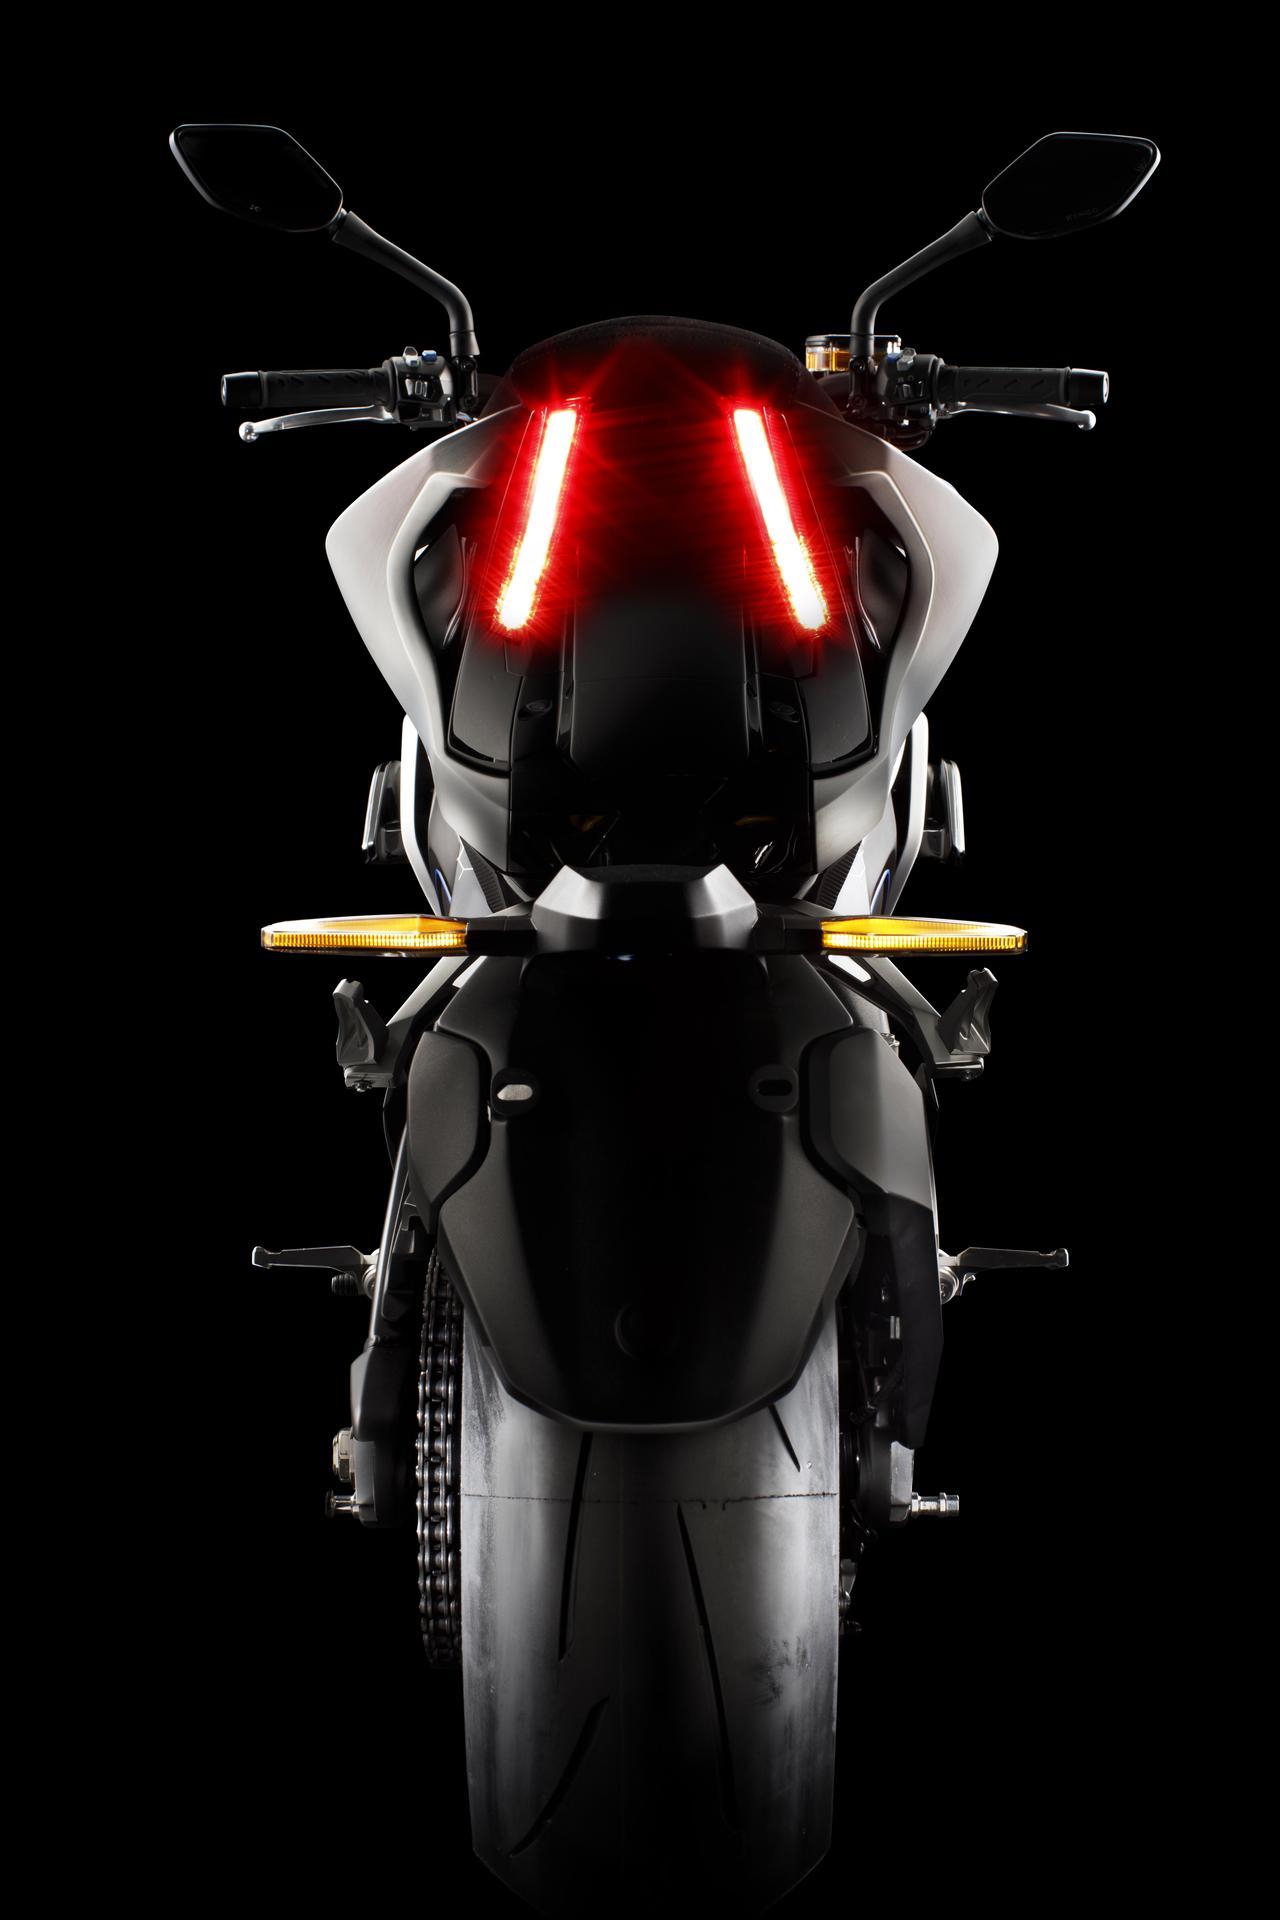 Images : 6番目の画像 - キムコ「RevoNEX」の写真を見る! - webオートバイ